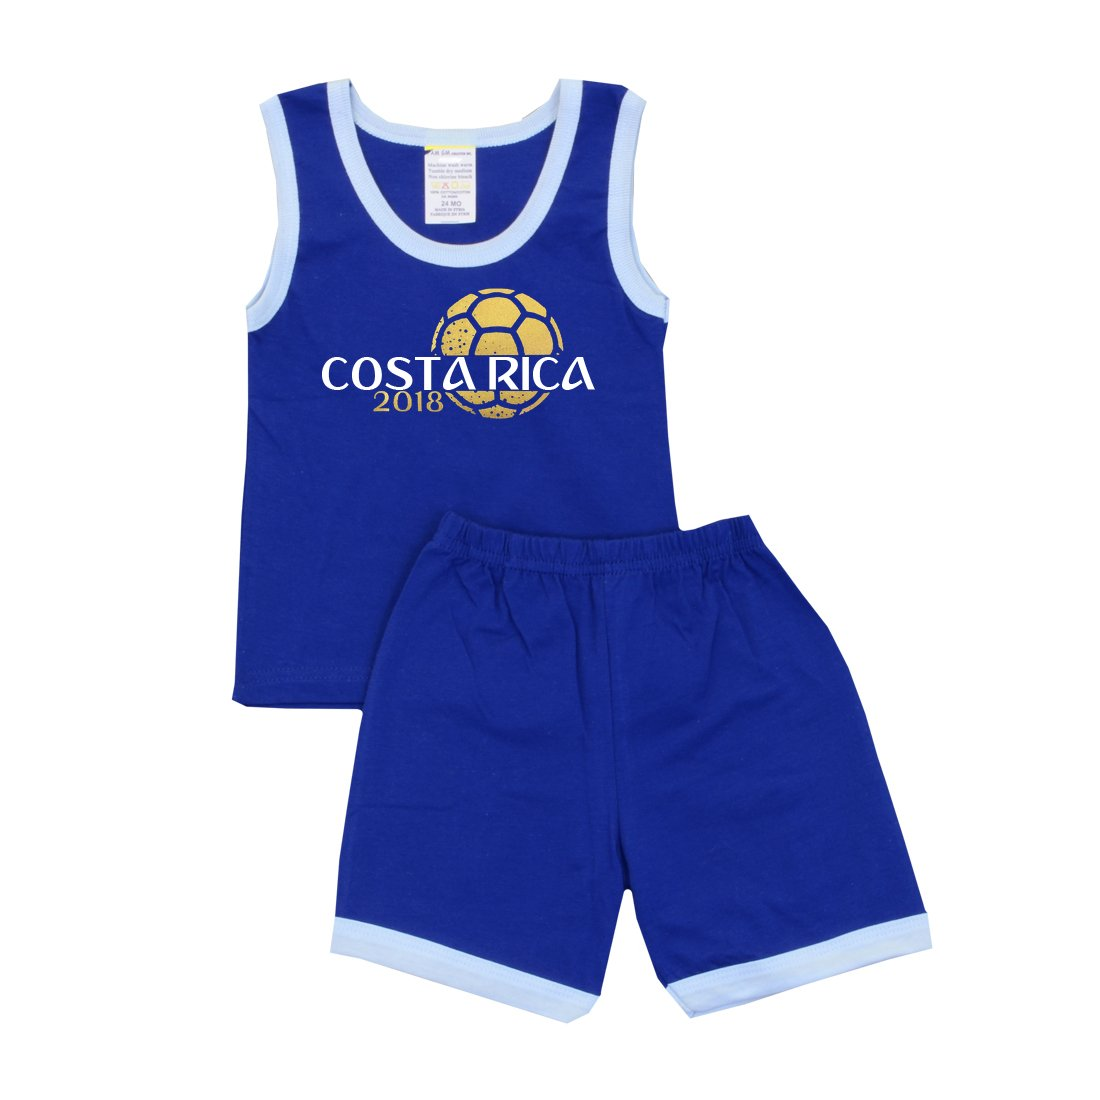 Pam GM Little Boys Soccer Shorts Set World Cup Costa Rica 2018